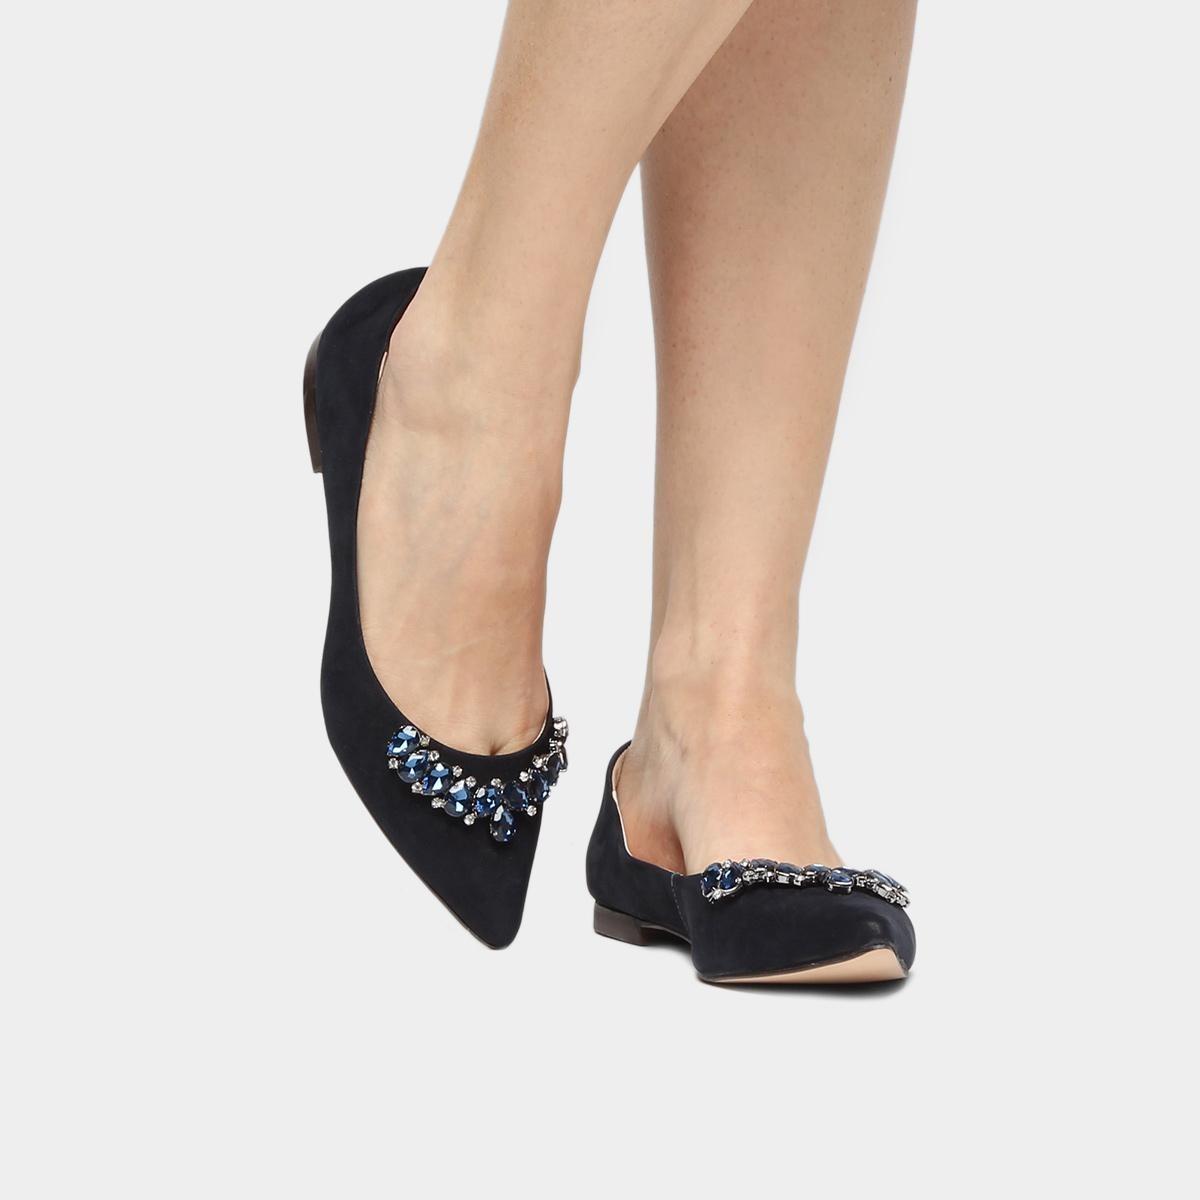 3676f8f23c sapatilha couro shoestock pedraria feminina. Carregando zoom.